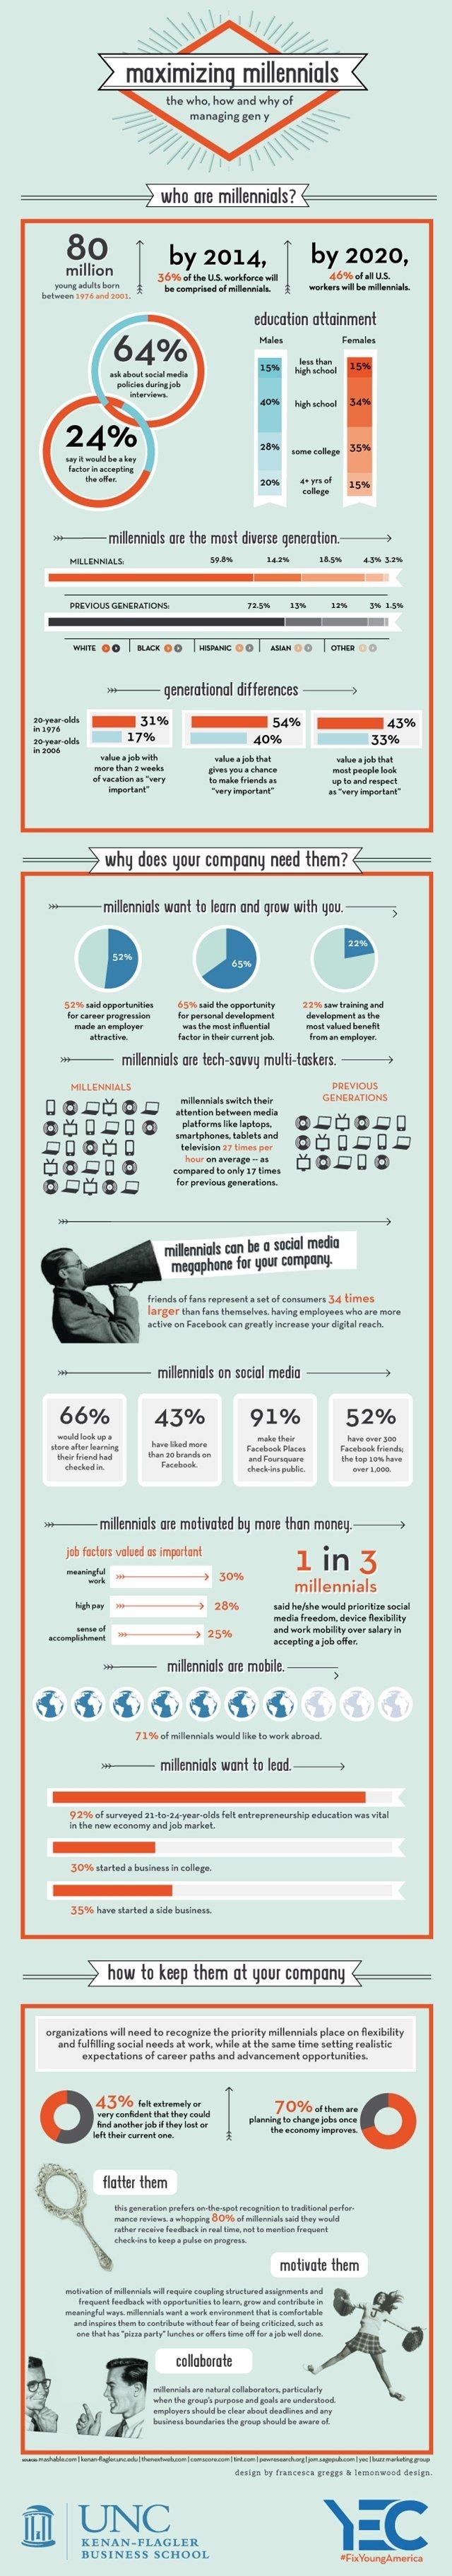 millenials and social media